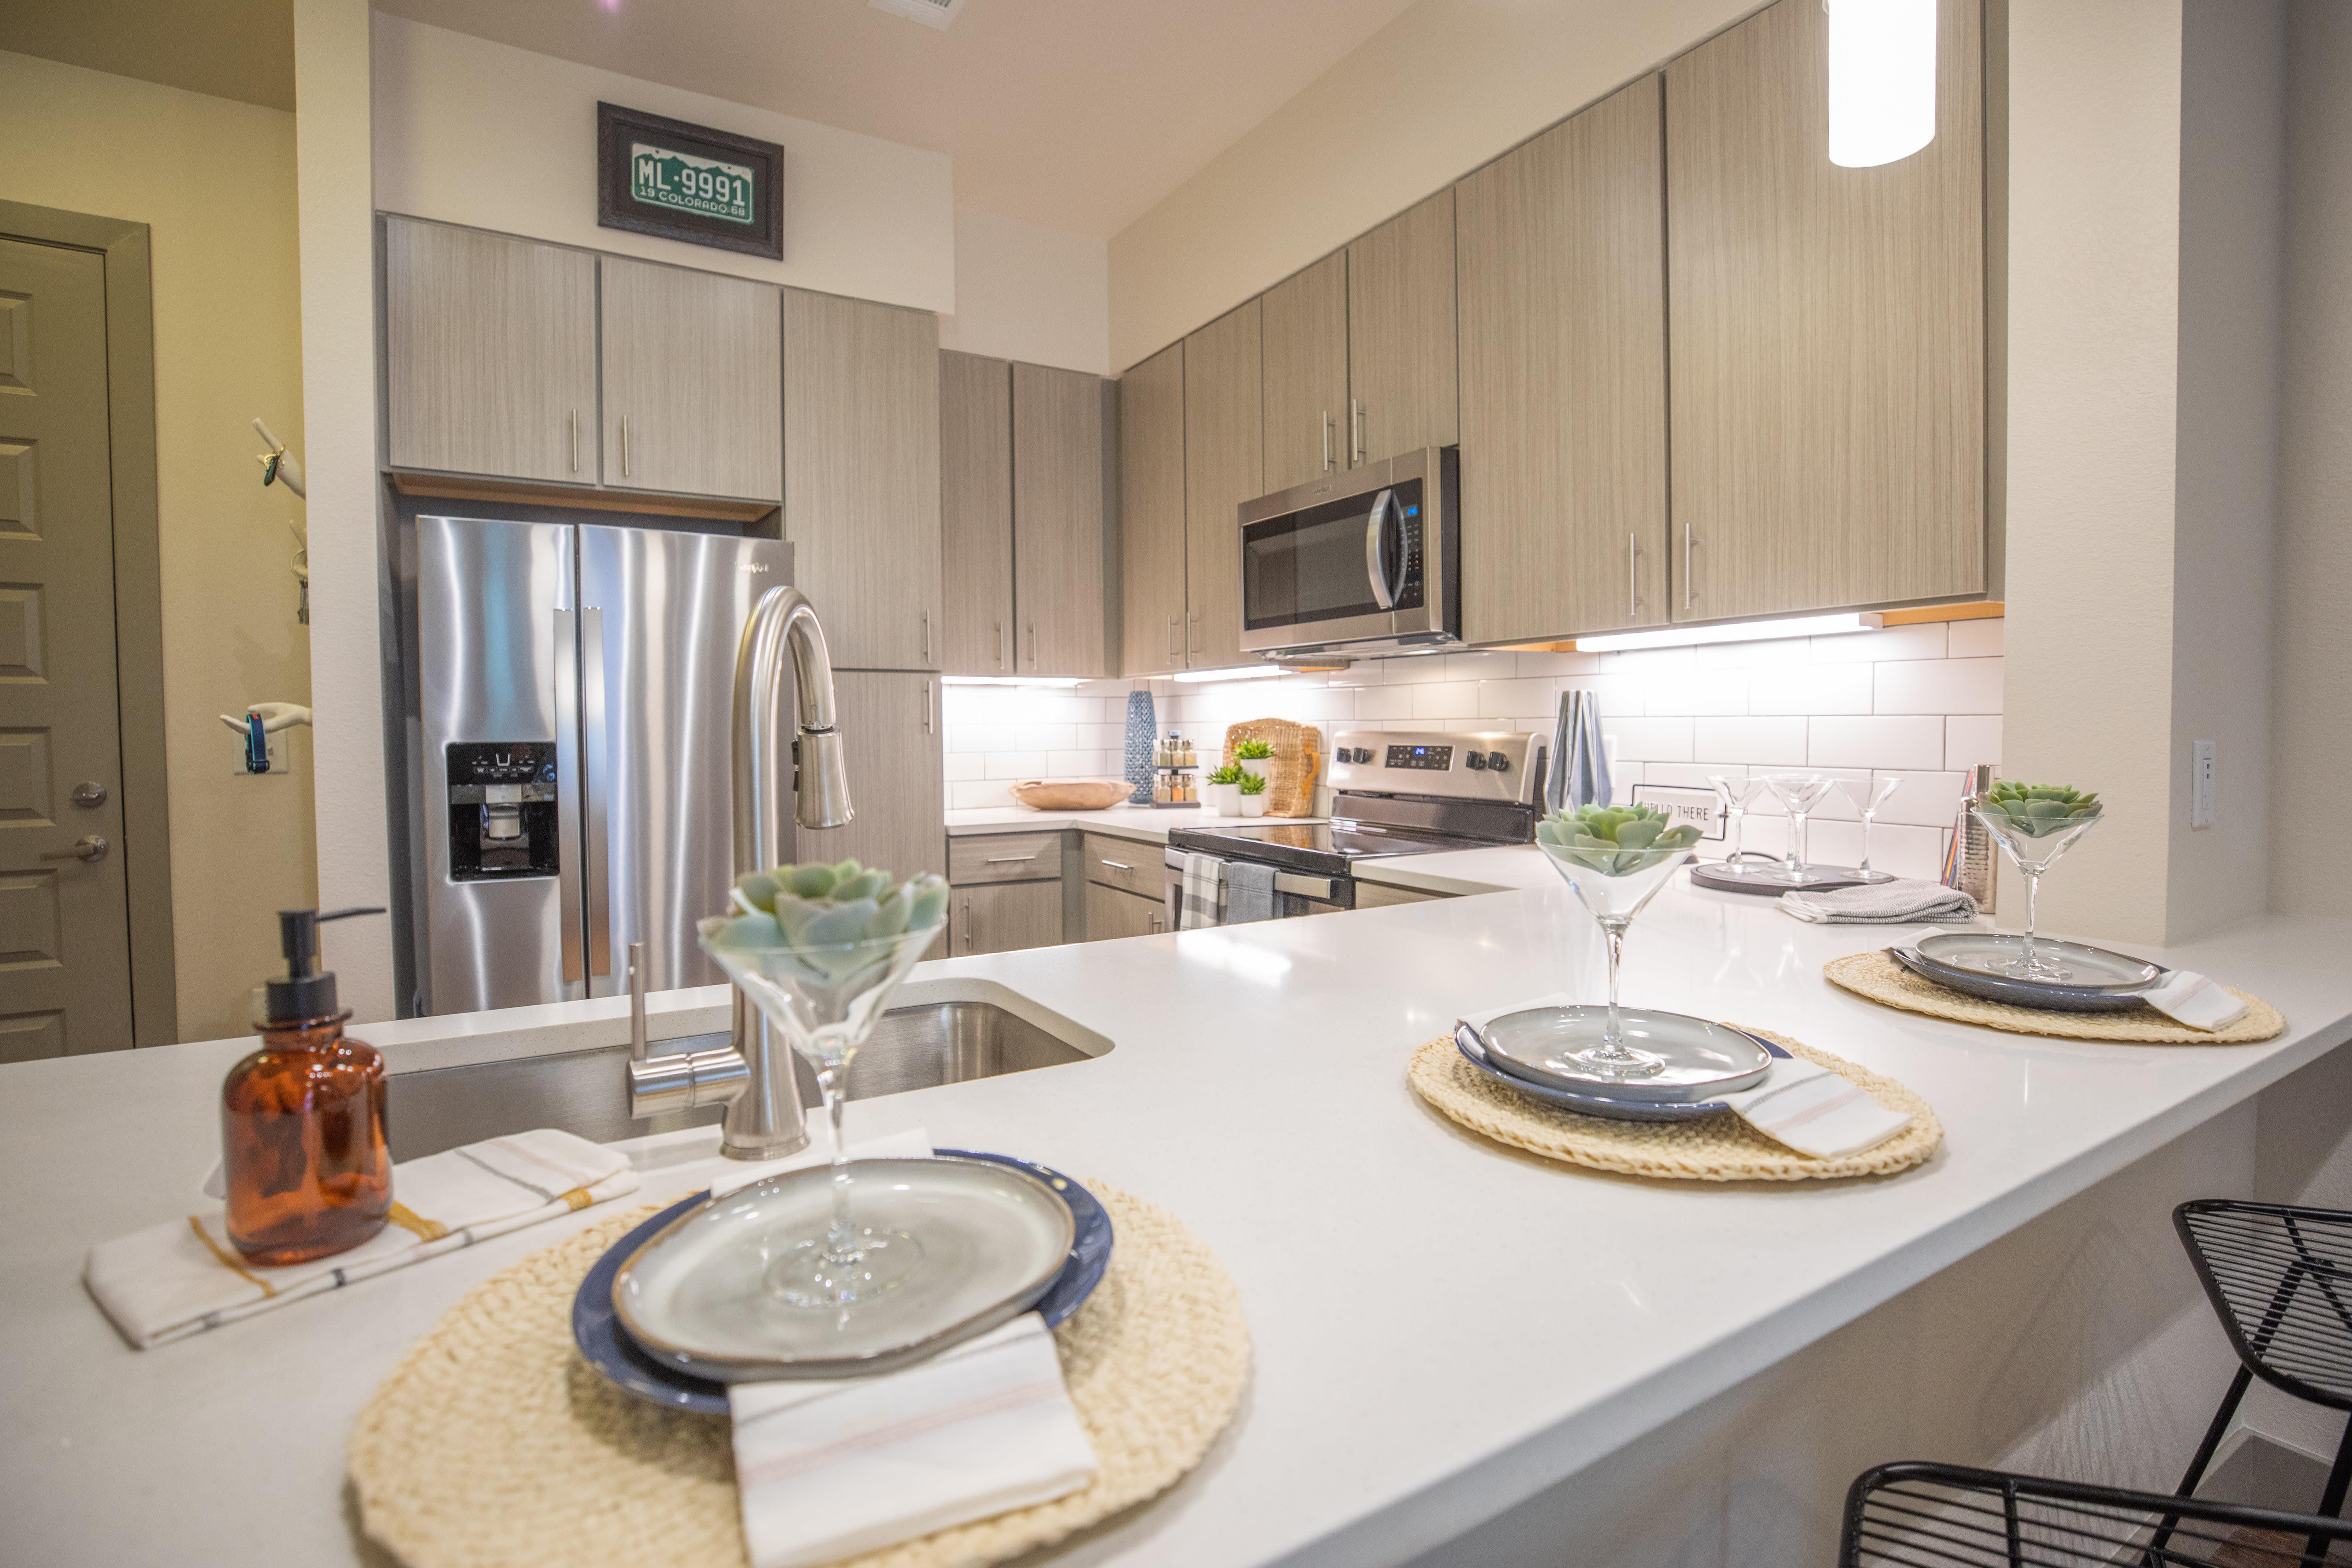 Clean minimalistic steel appliance kitchen at The Alcott in Denver, Colorado